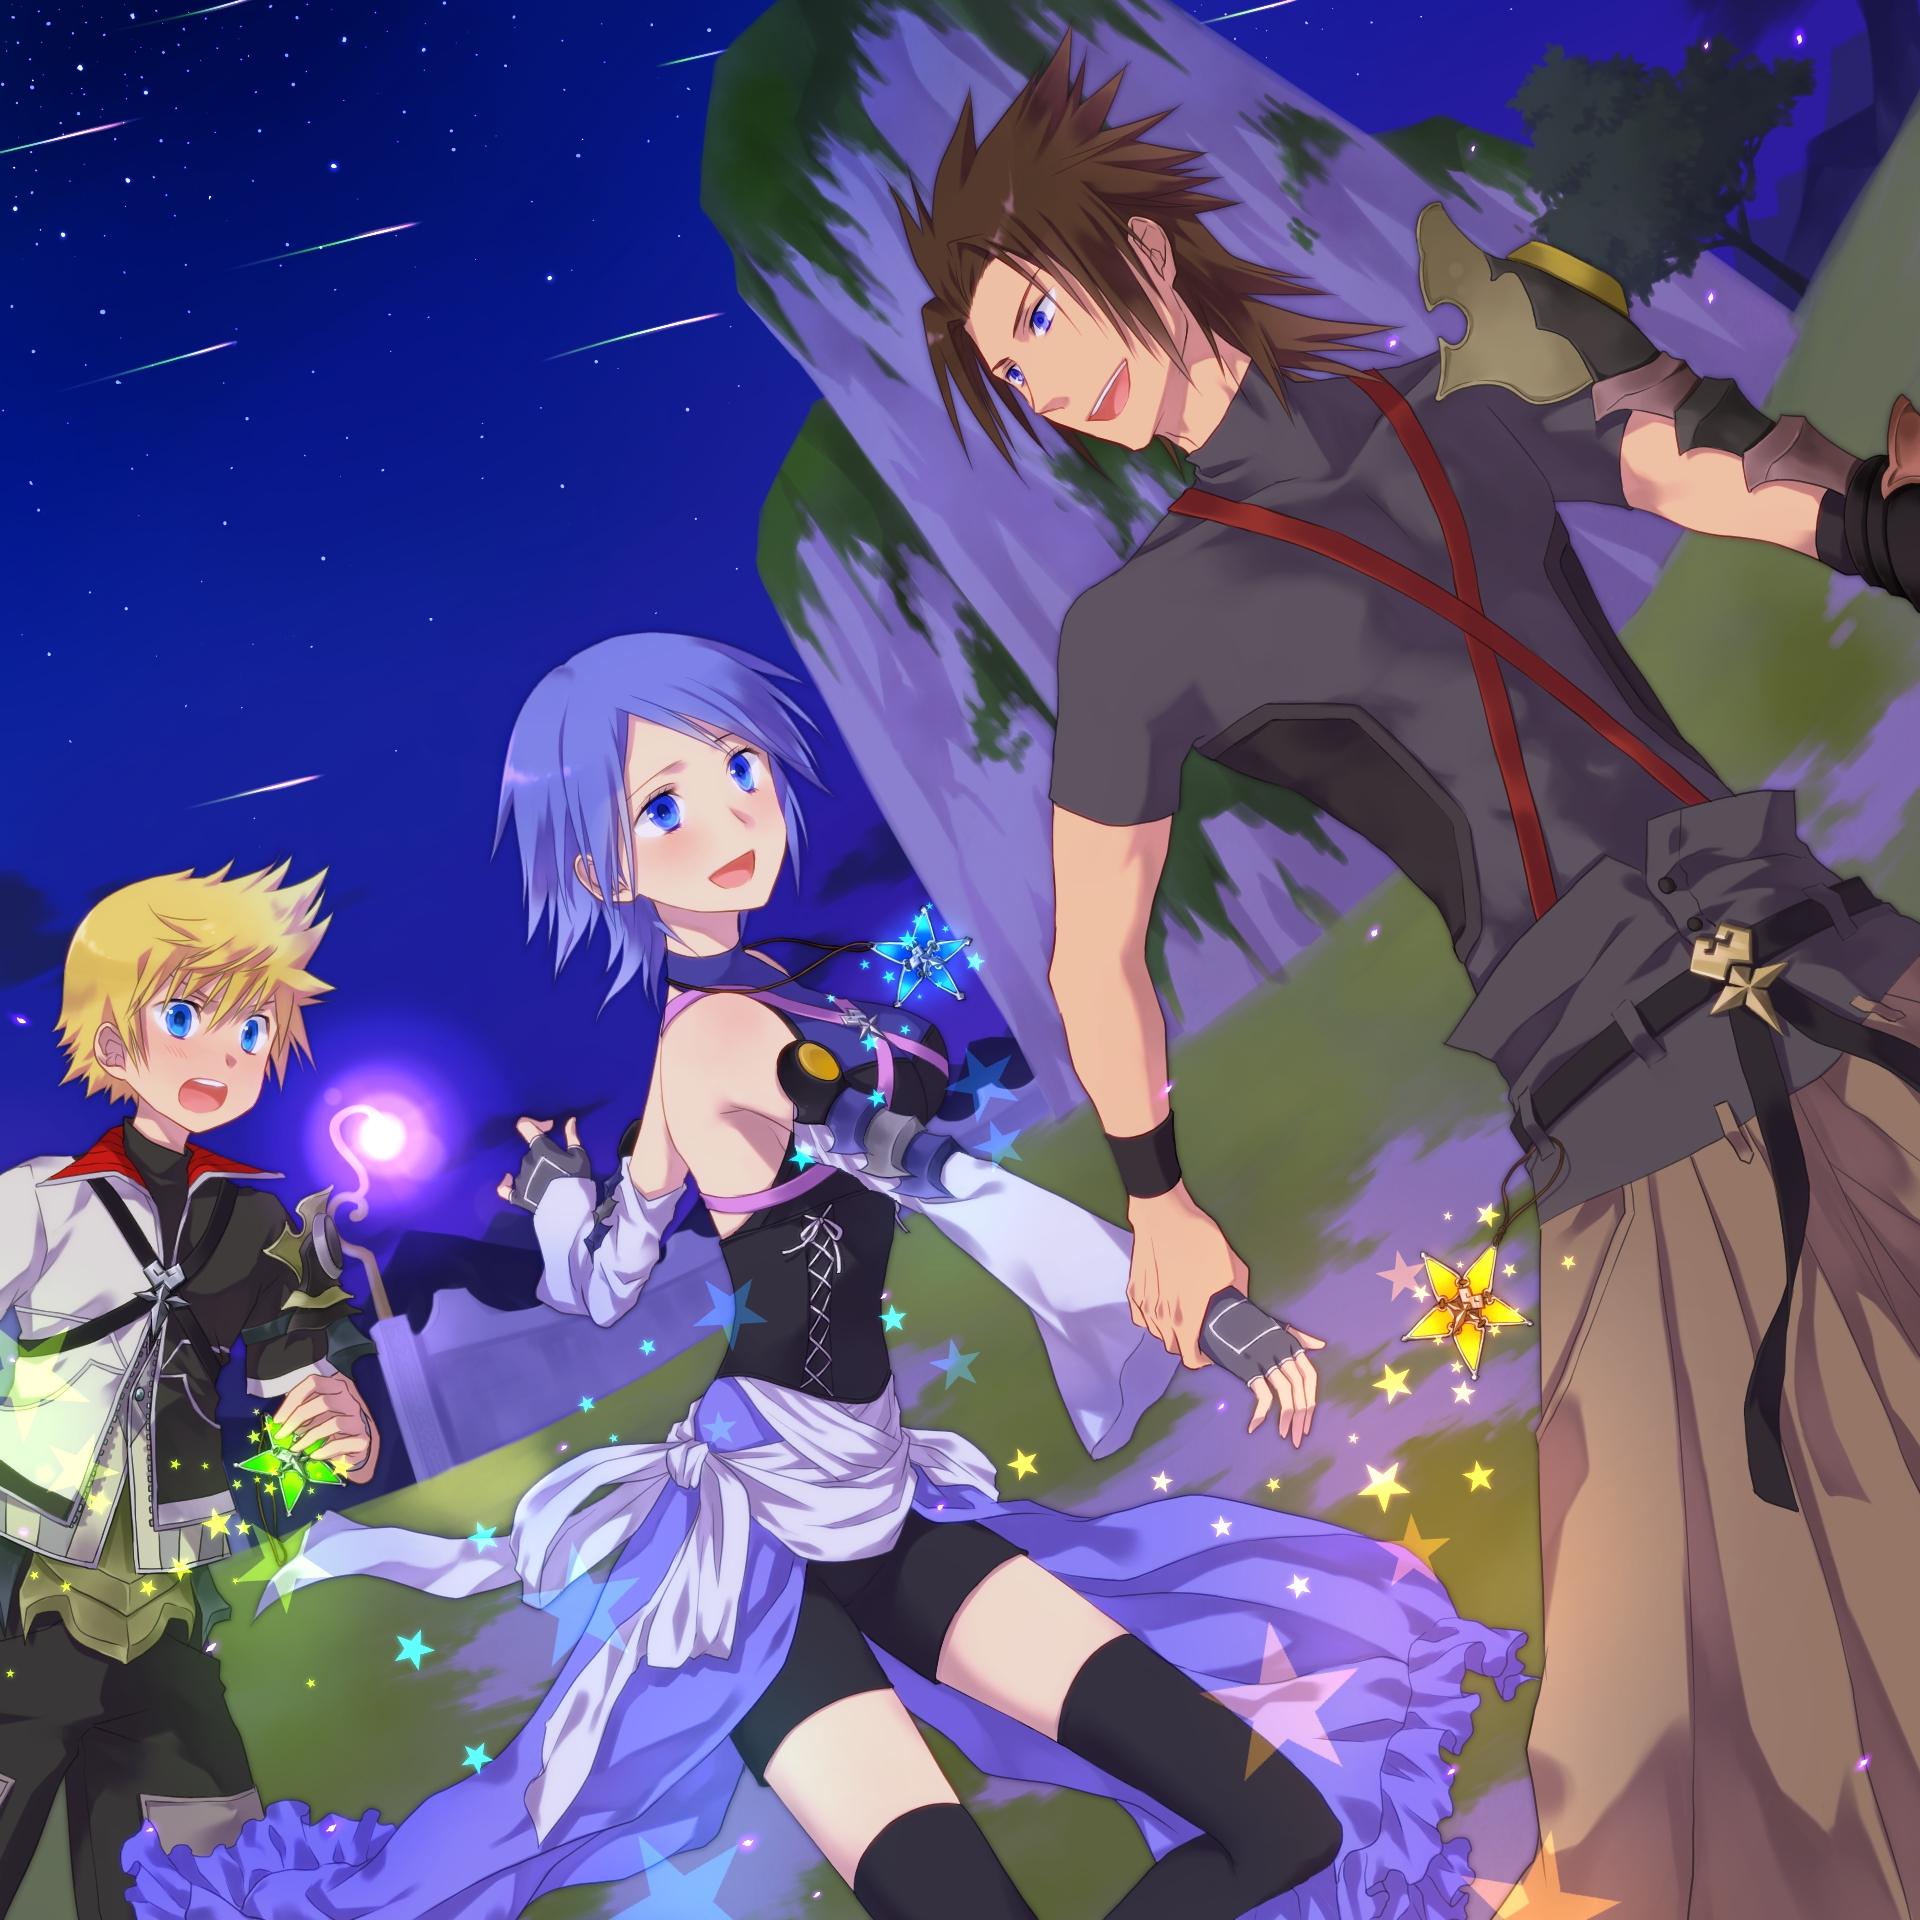 Aqua (Kingdom Hearts), Fanart | page 2 - Zerochan Anime ... Terra And Aqua Fanfiction